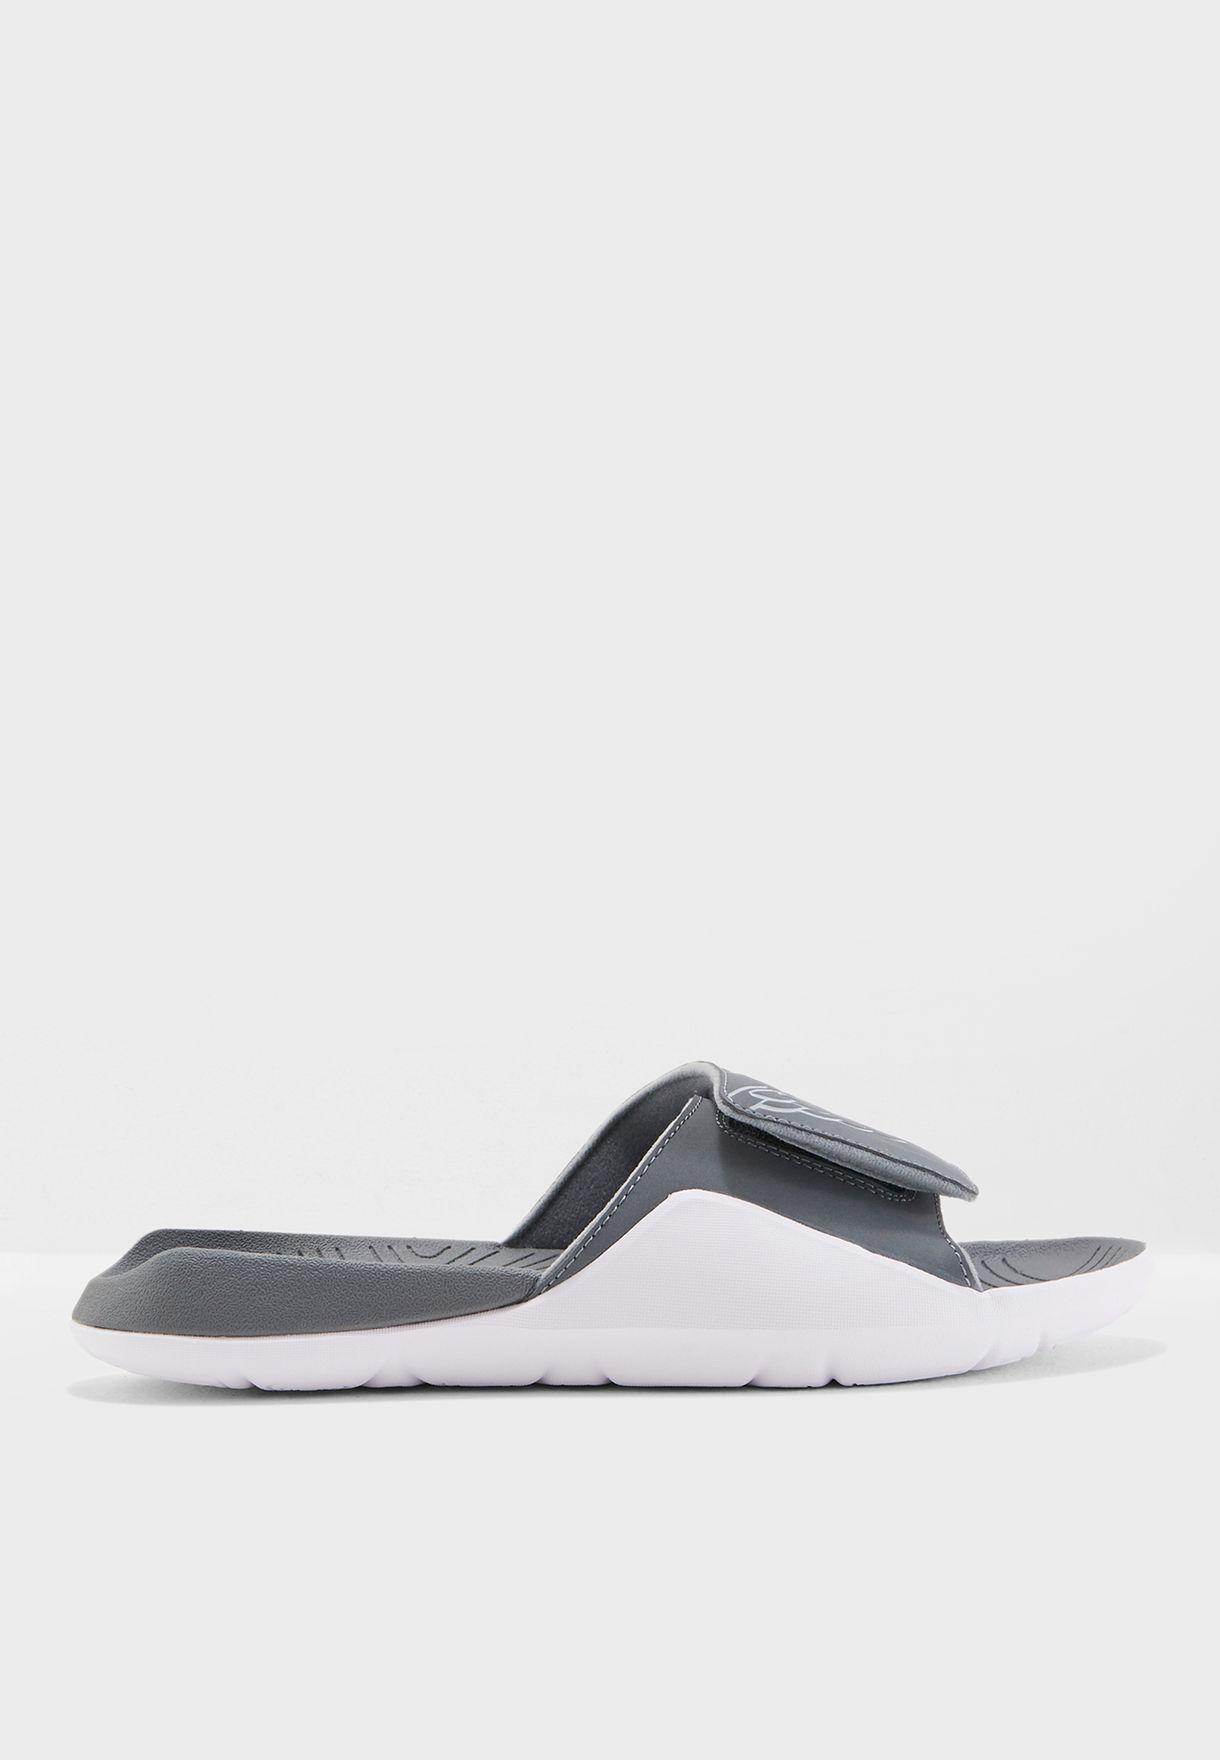 c307222eb392 Shop Nike grey Jordan Hydro 7 Slides AA2517-002 for Men in UAE ...